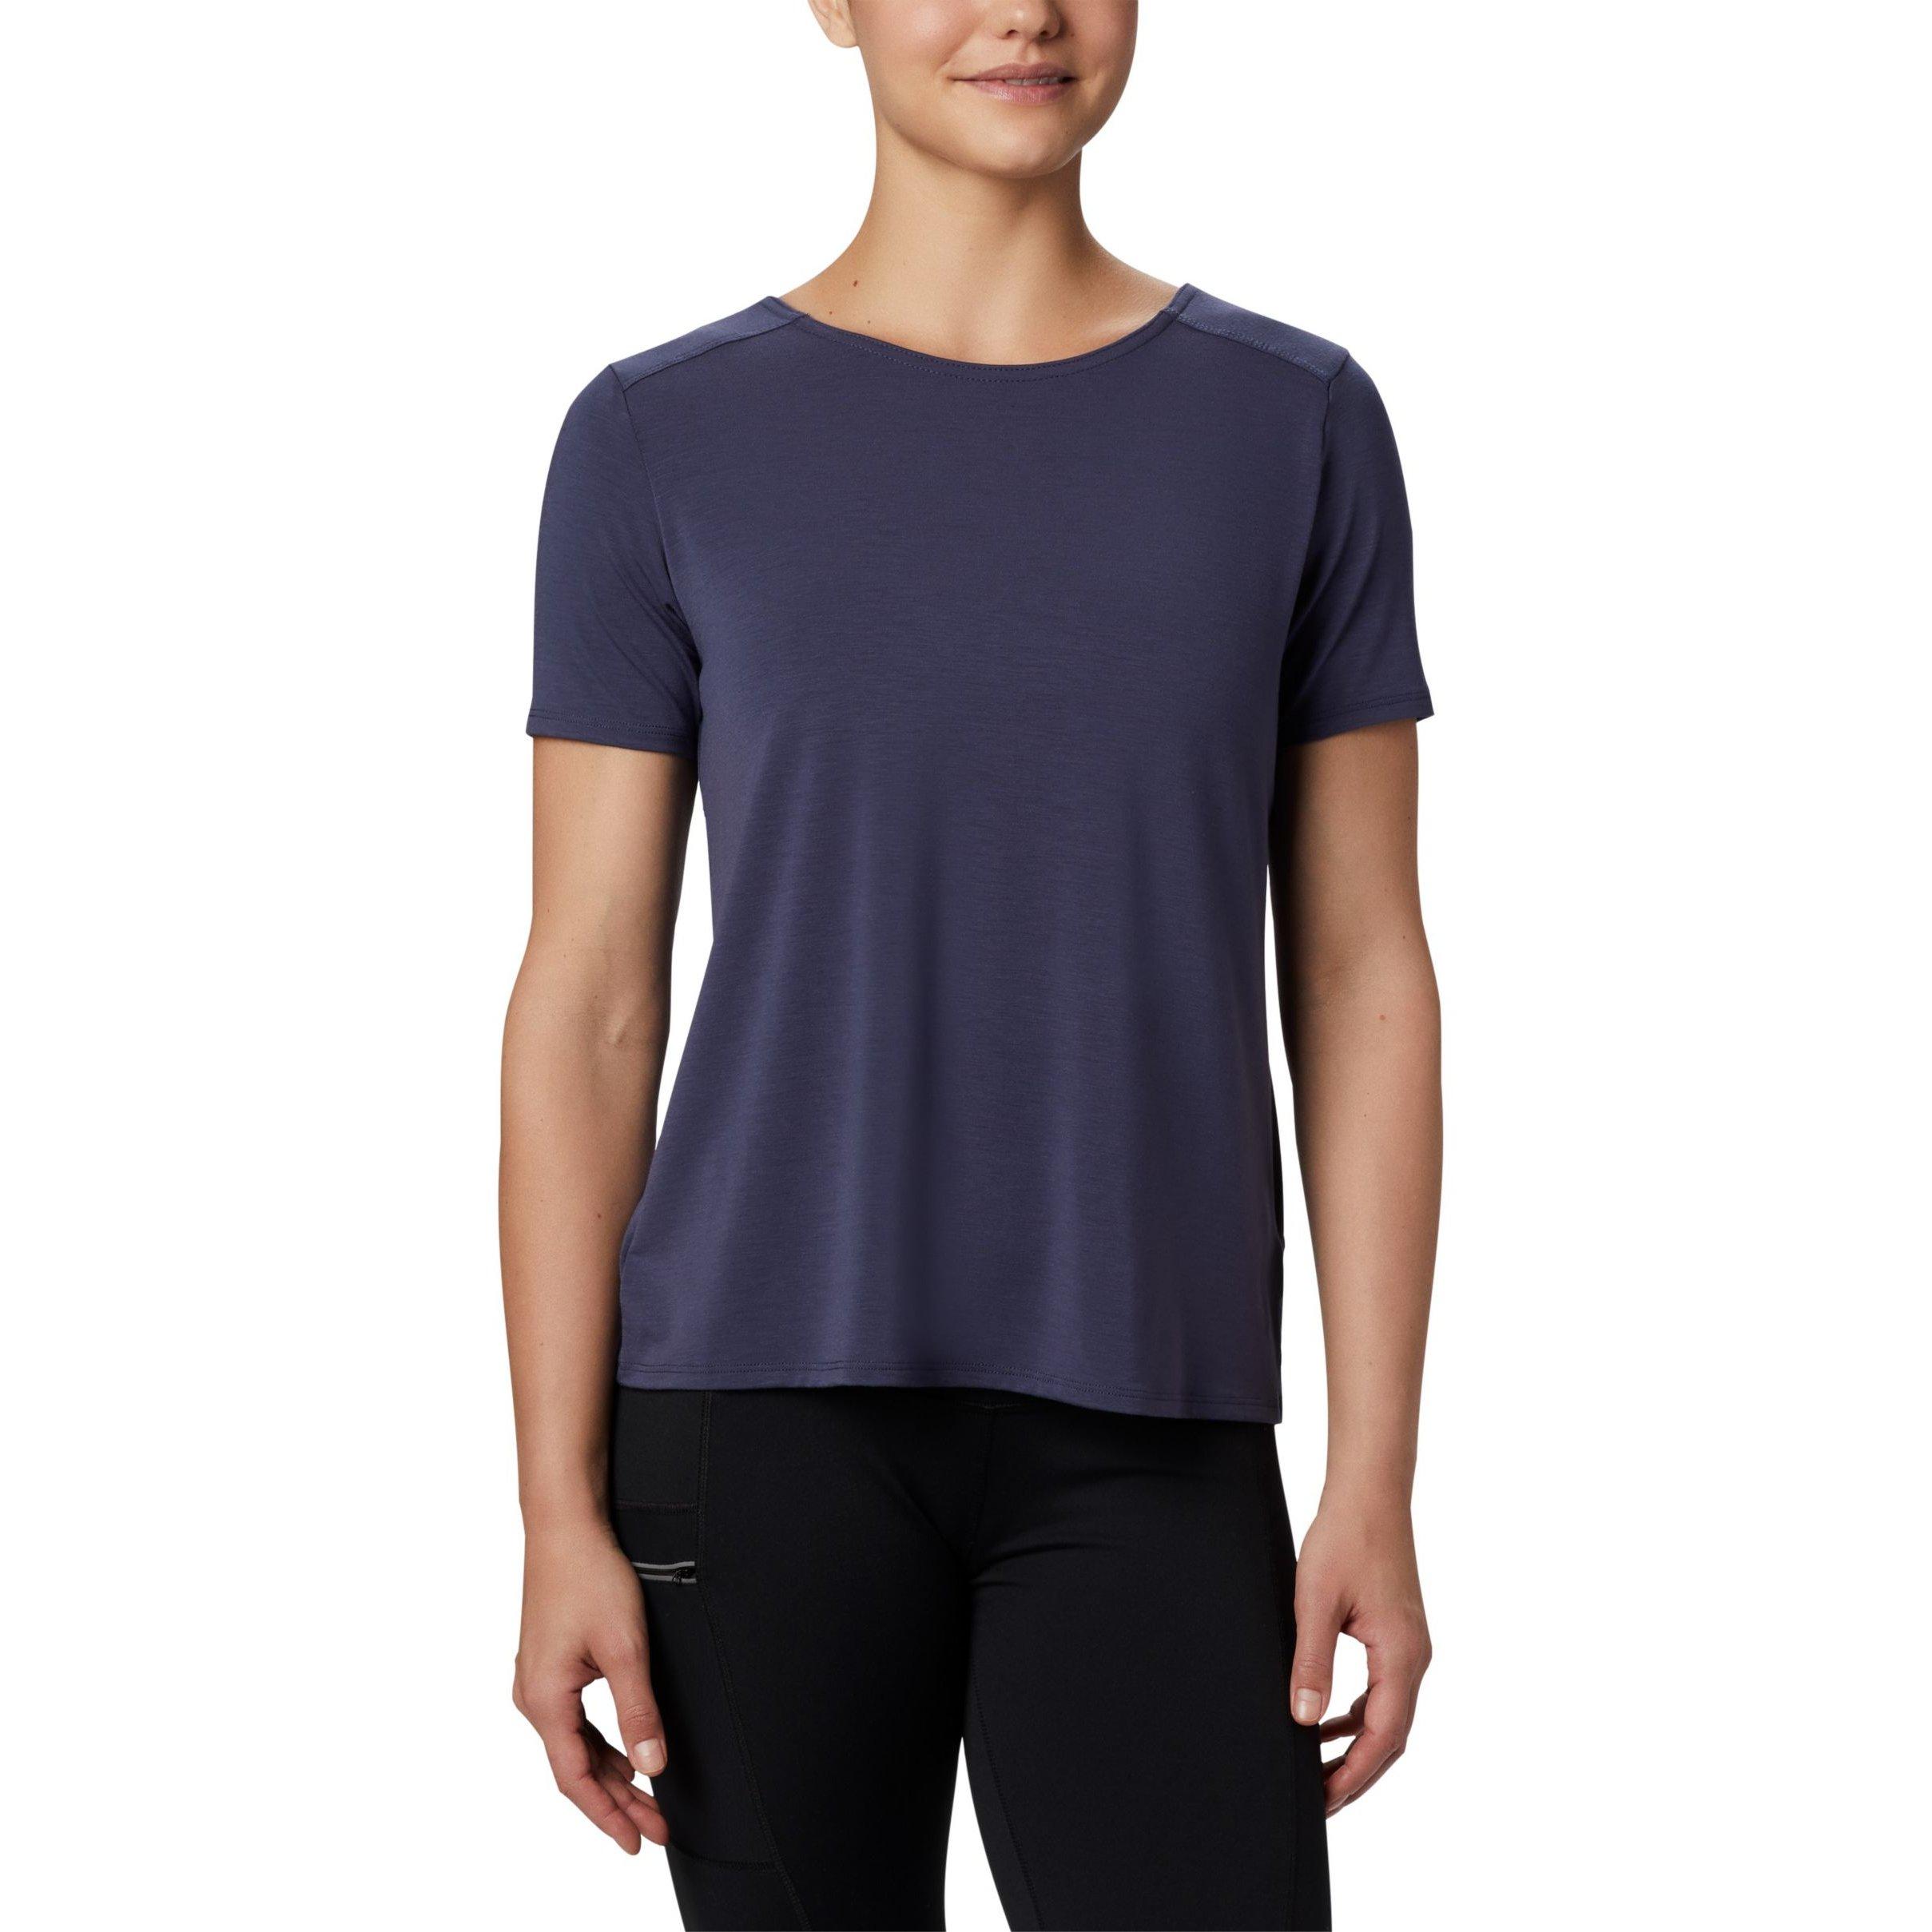 Essential Elements Short Sleeve - Women's